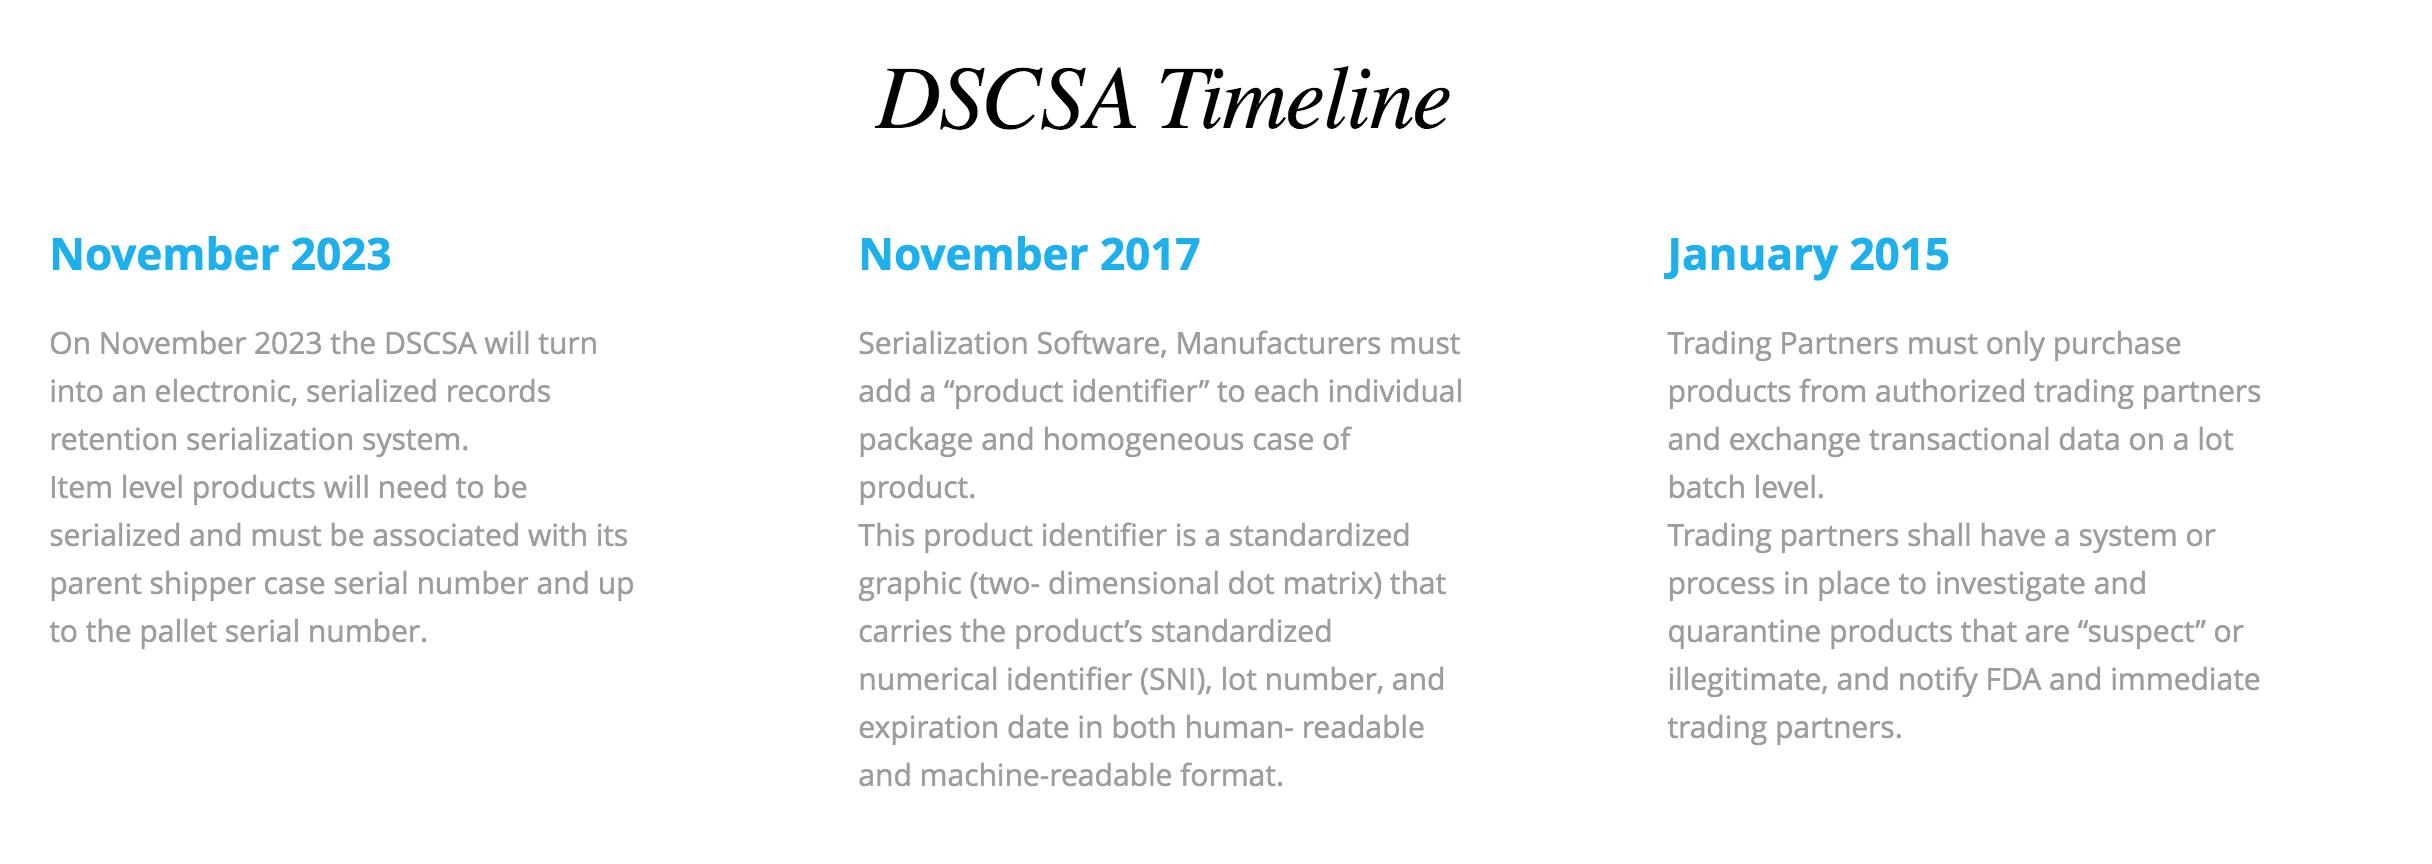 DSCSA Timeline